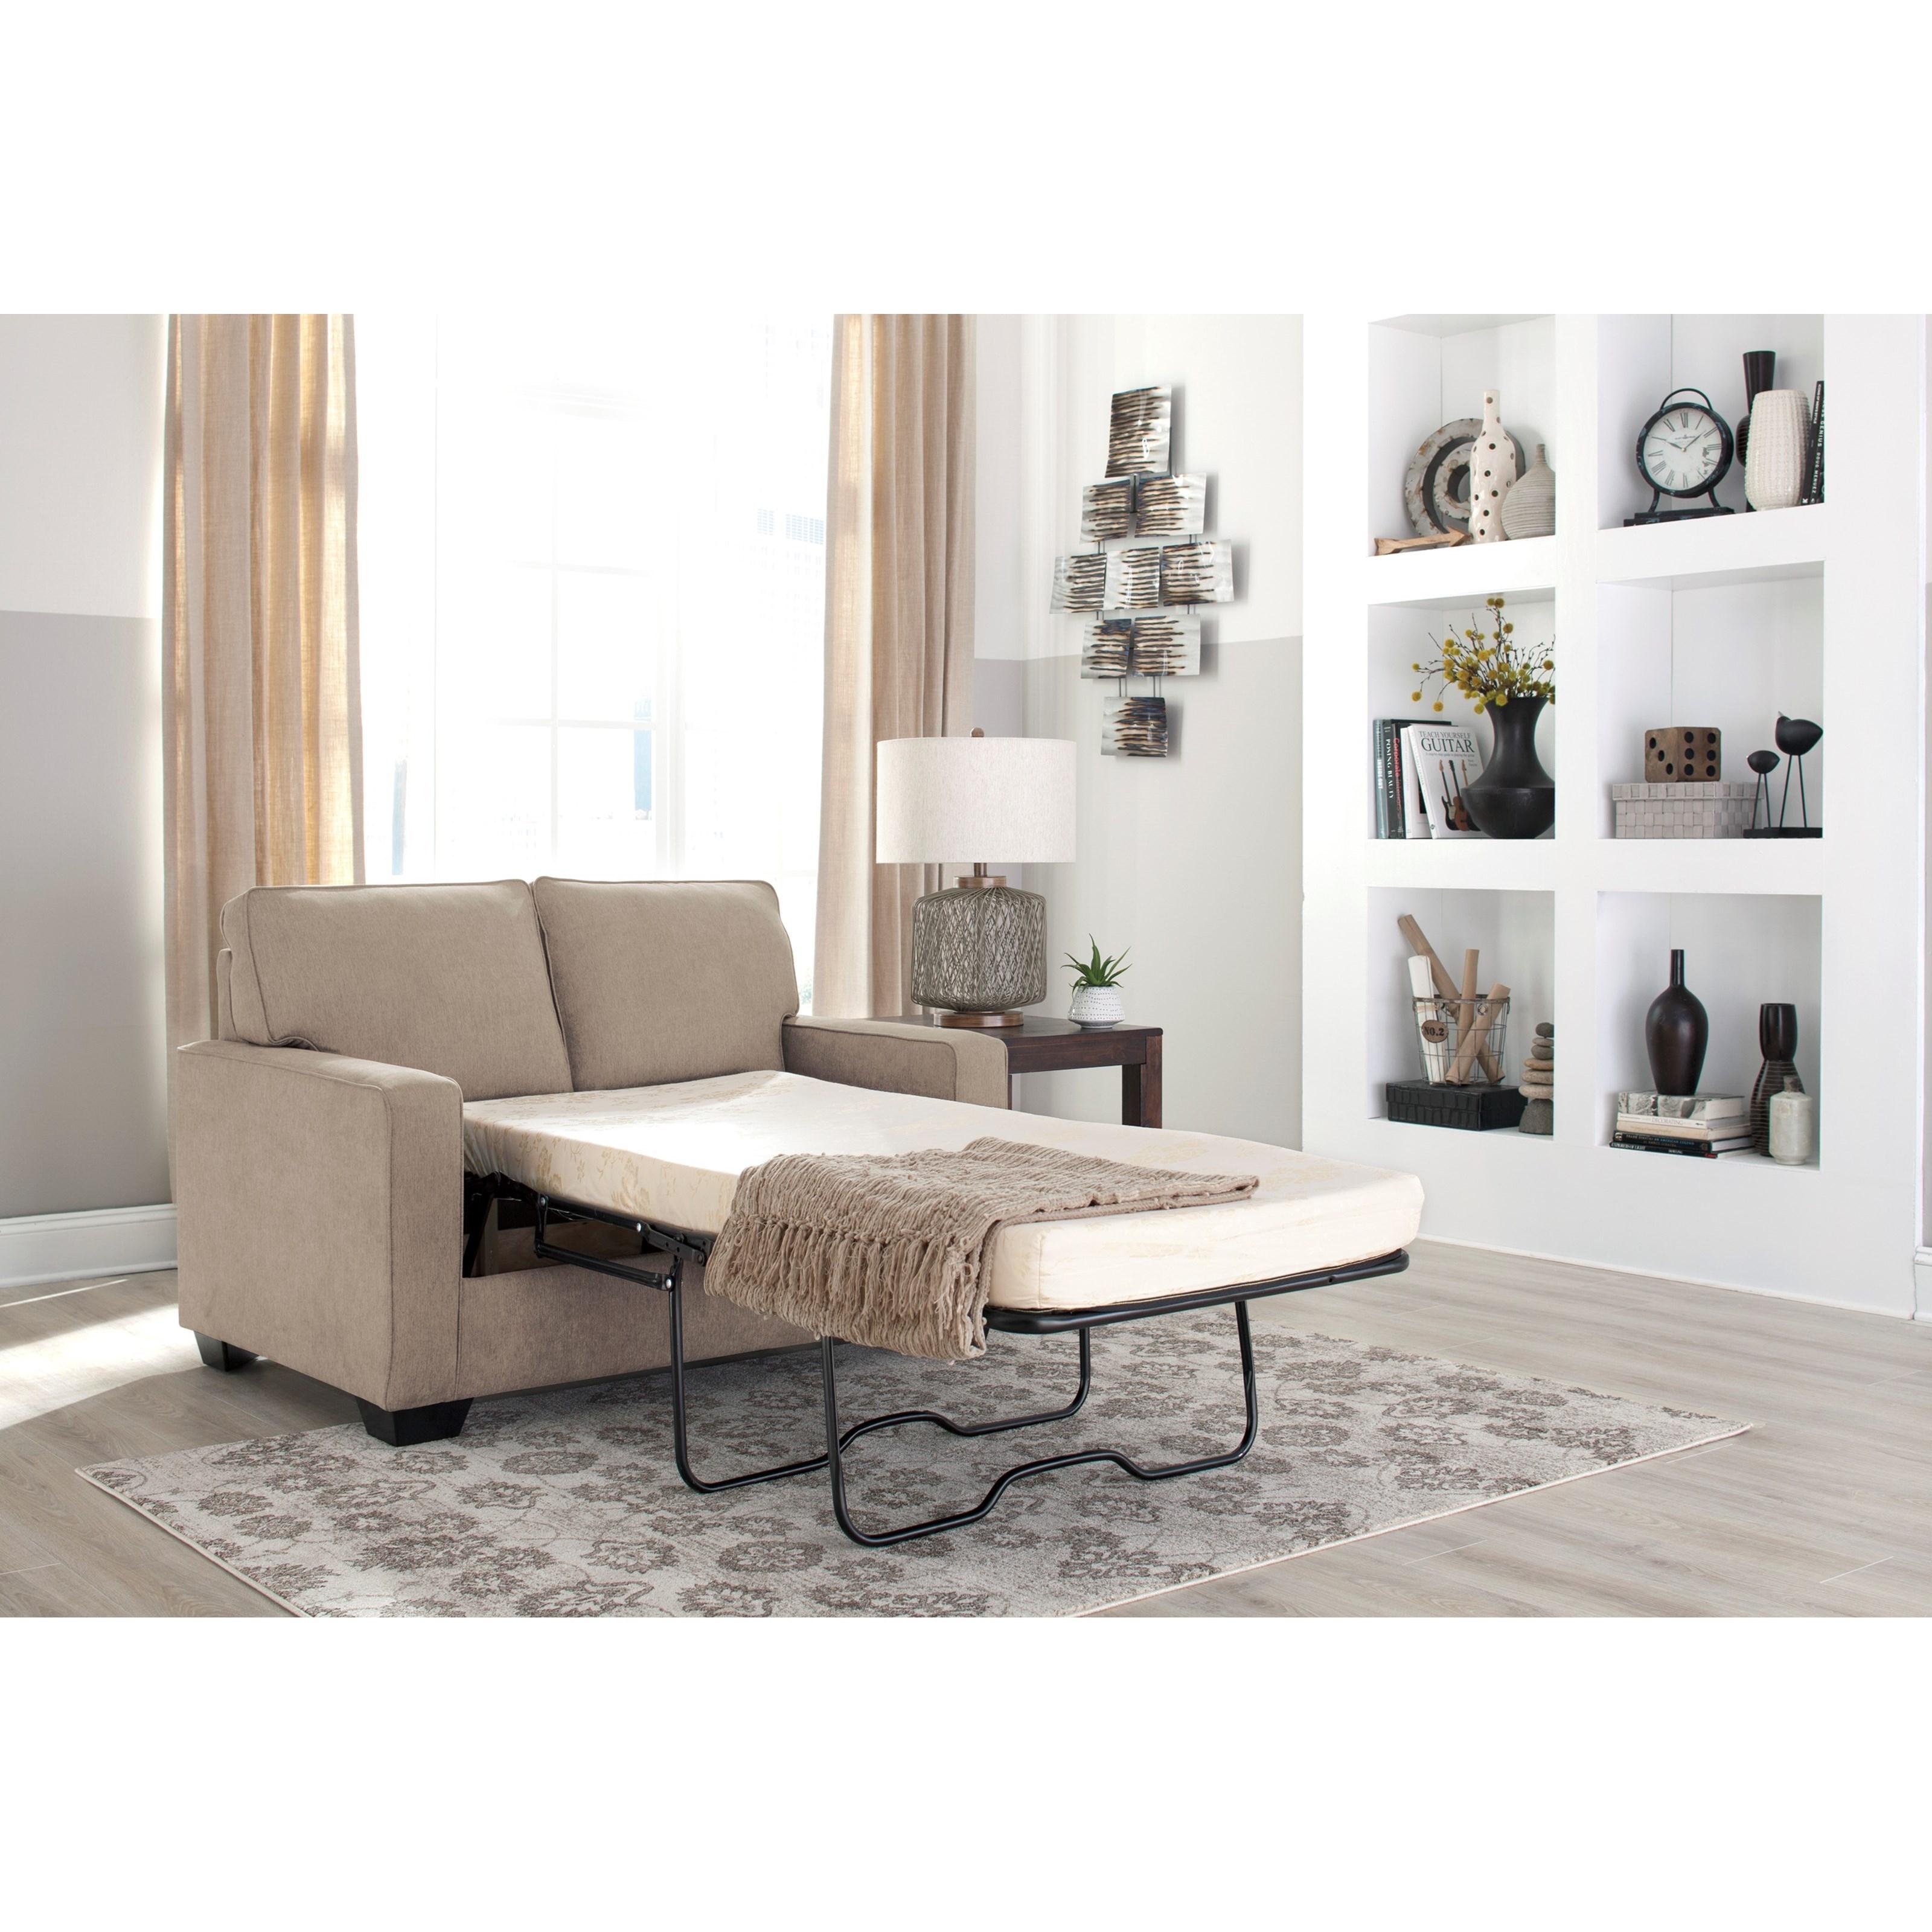 Modern Twin Sleeper Sofa: Signature Design By Ashley Zeb 3590237 Twin Sofa Sleeper